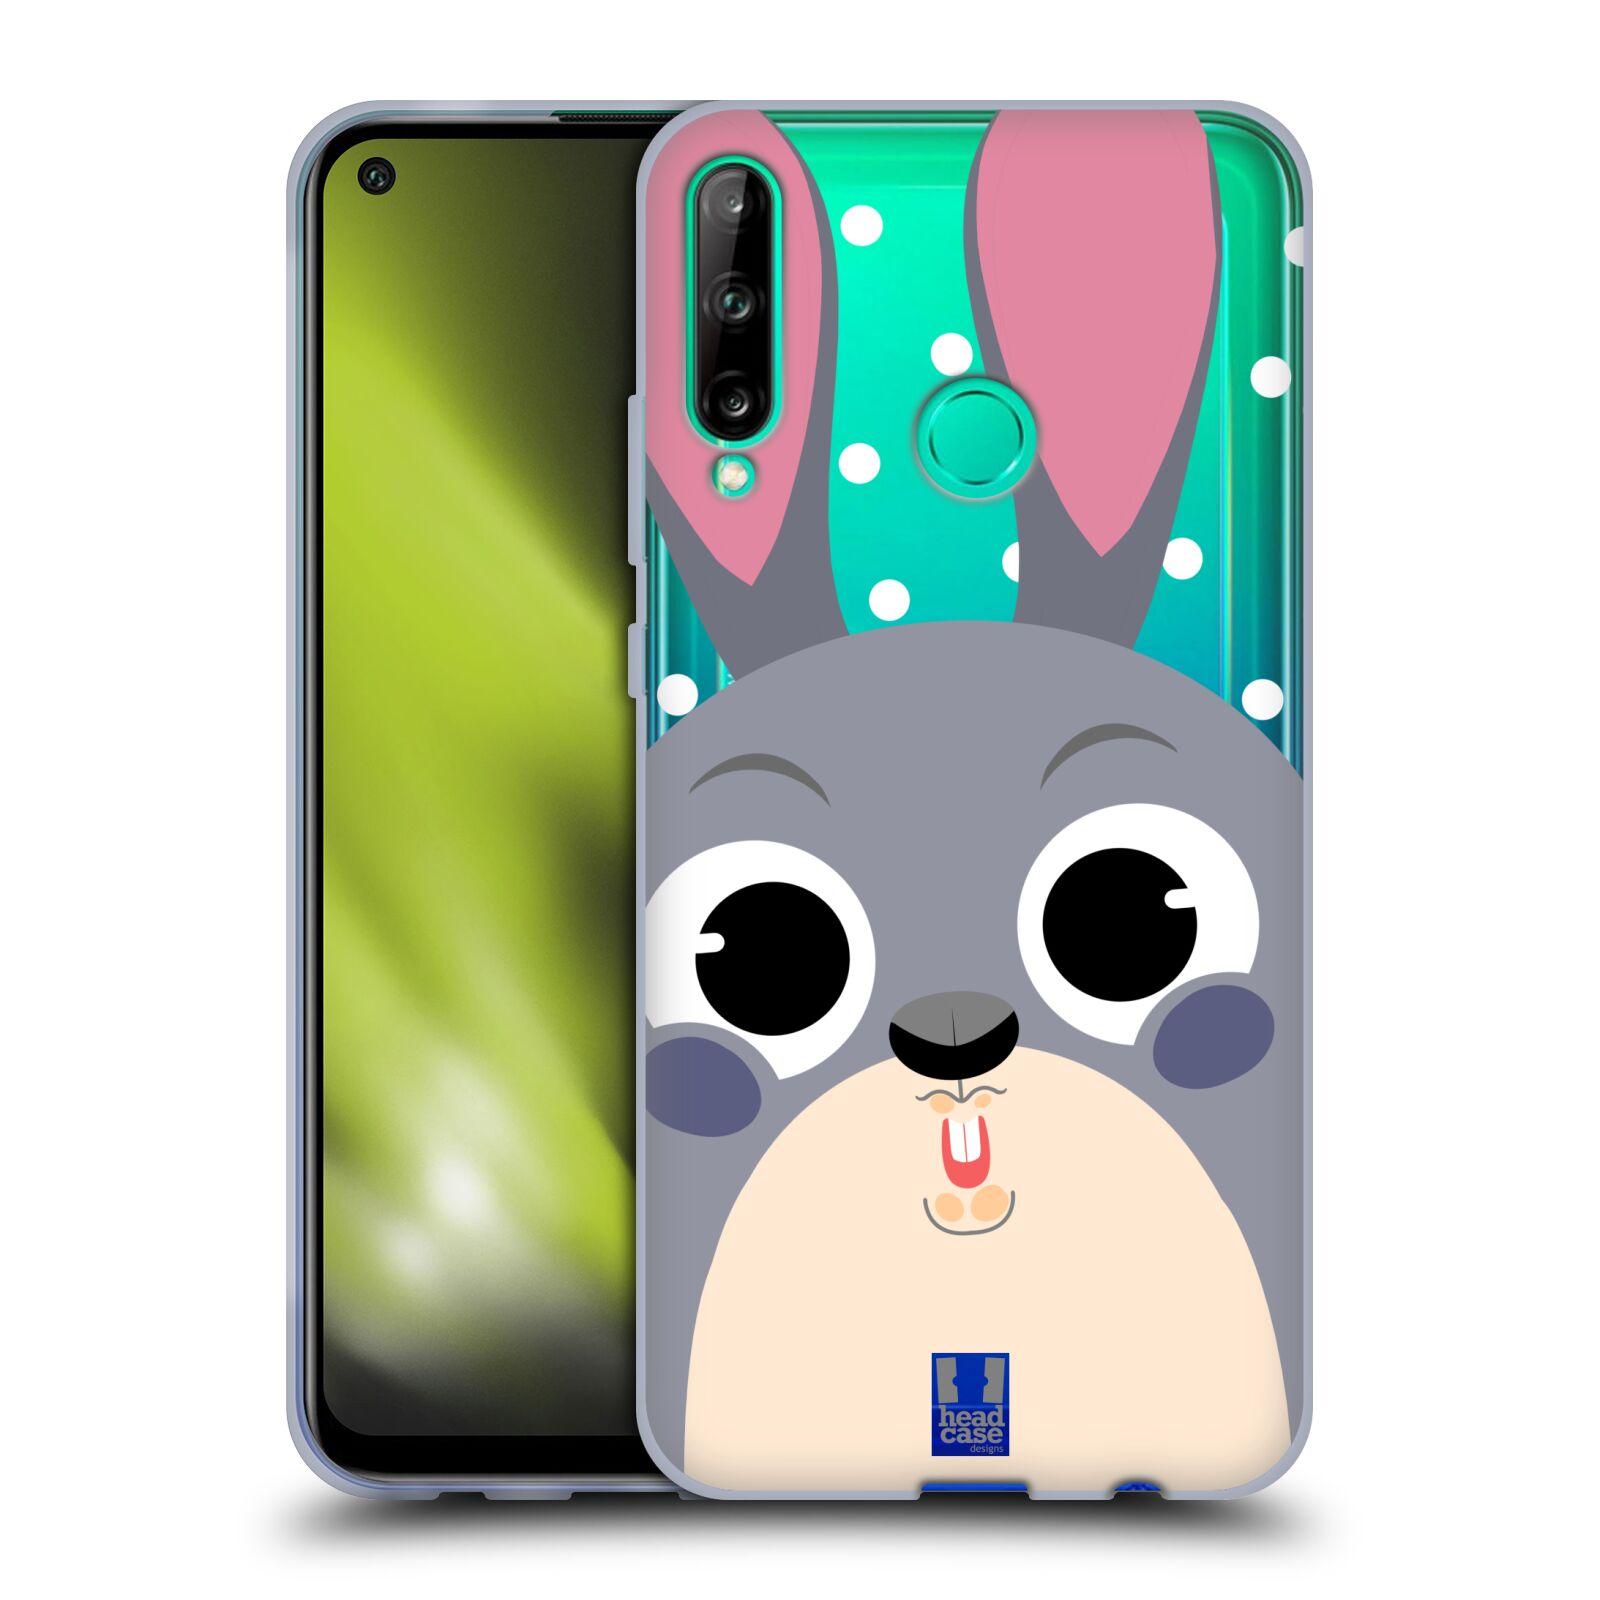 Silikonové pouzdro na mobil Huawei P40 Lite E - Head Case - Králíček roztomilouš